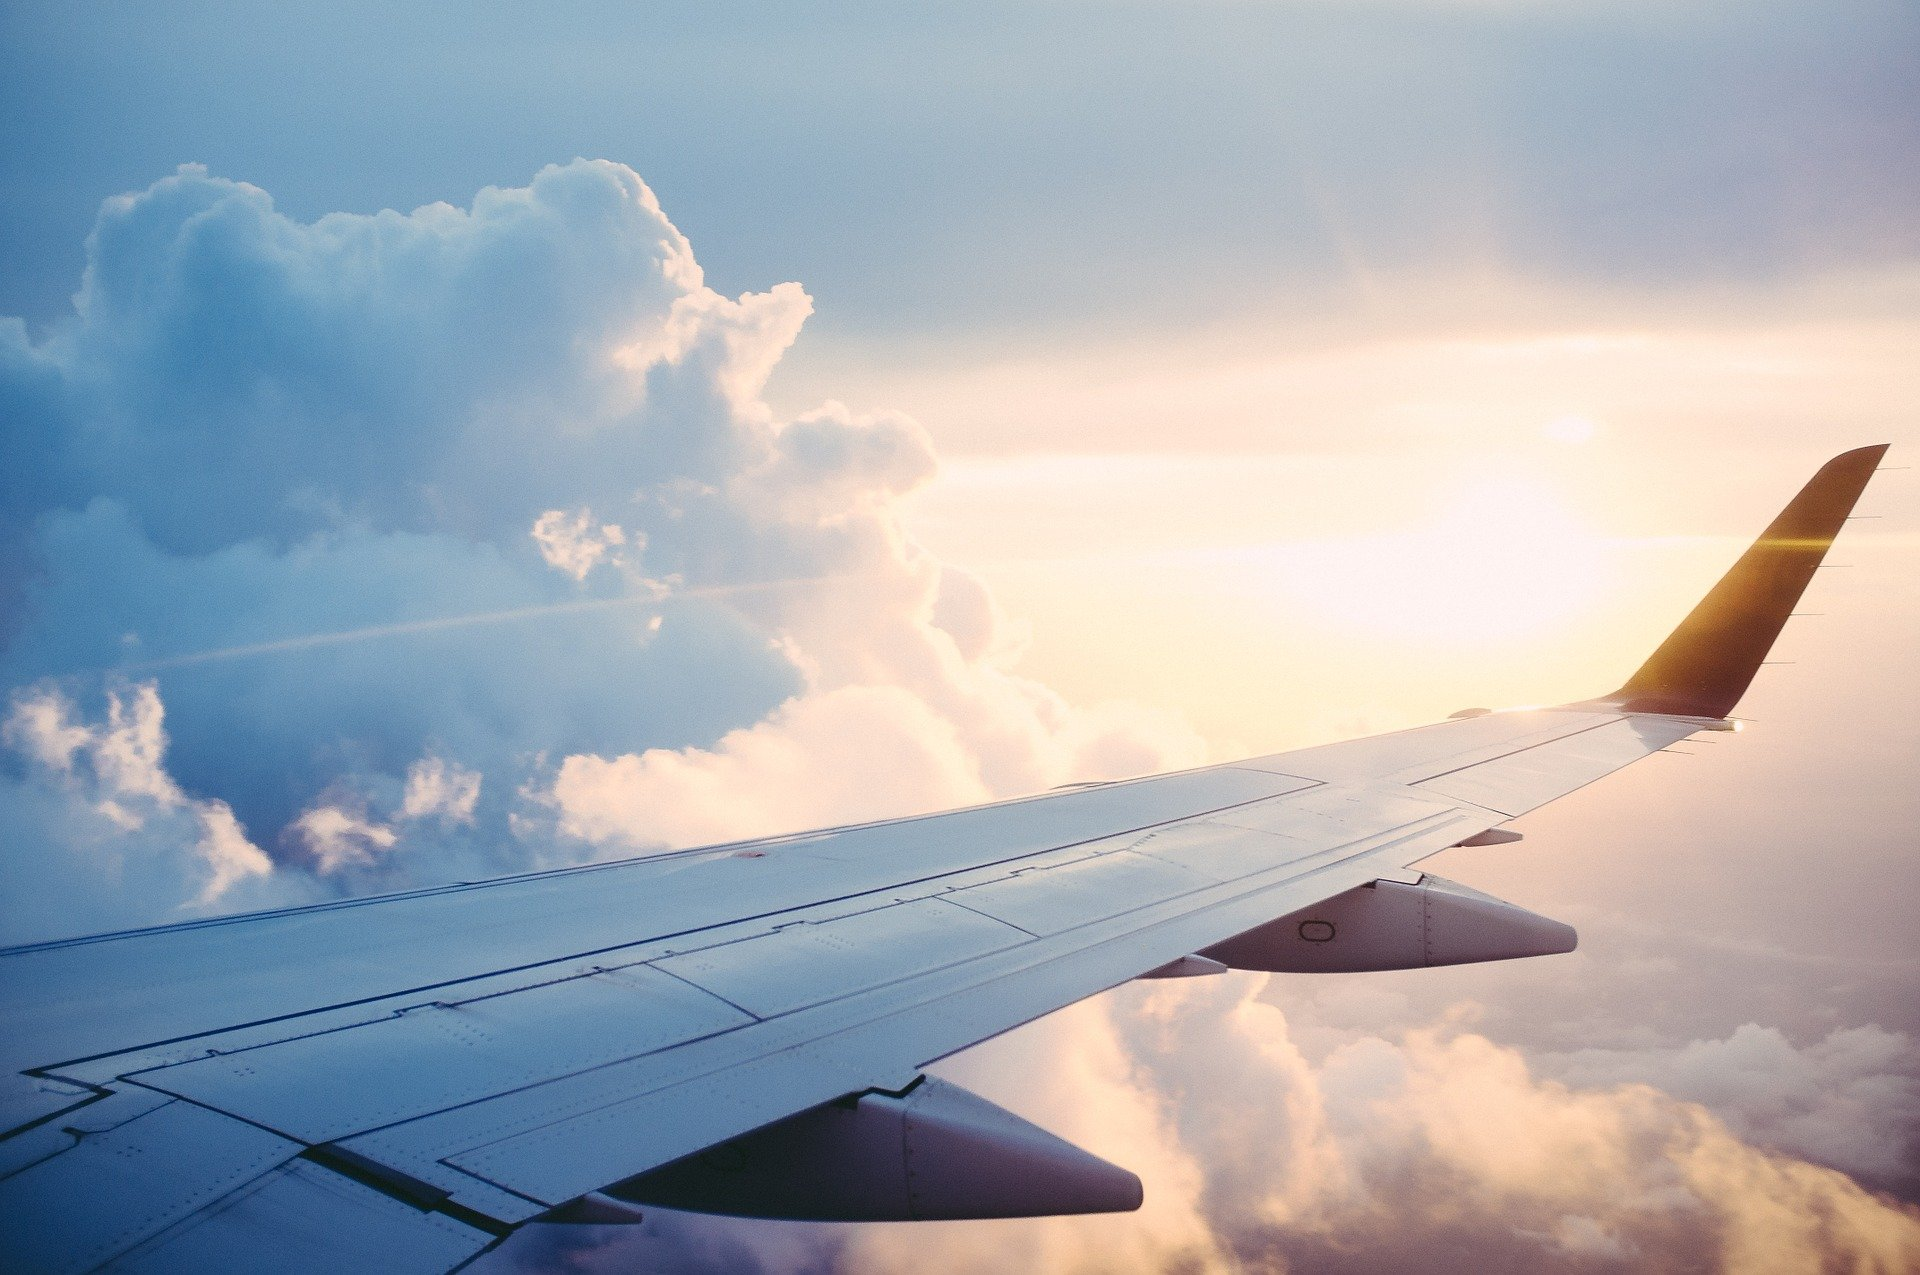 Ala de avion. Fuente: Pixabay